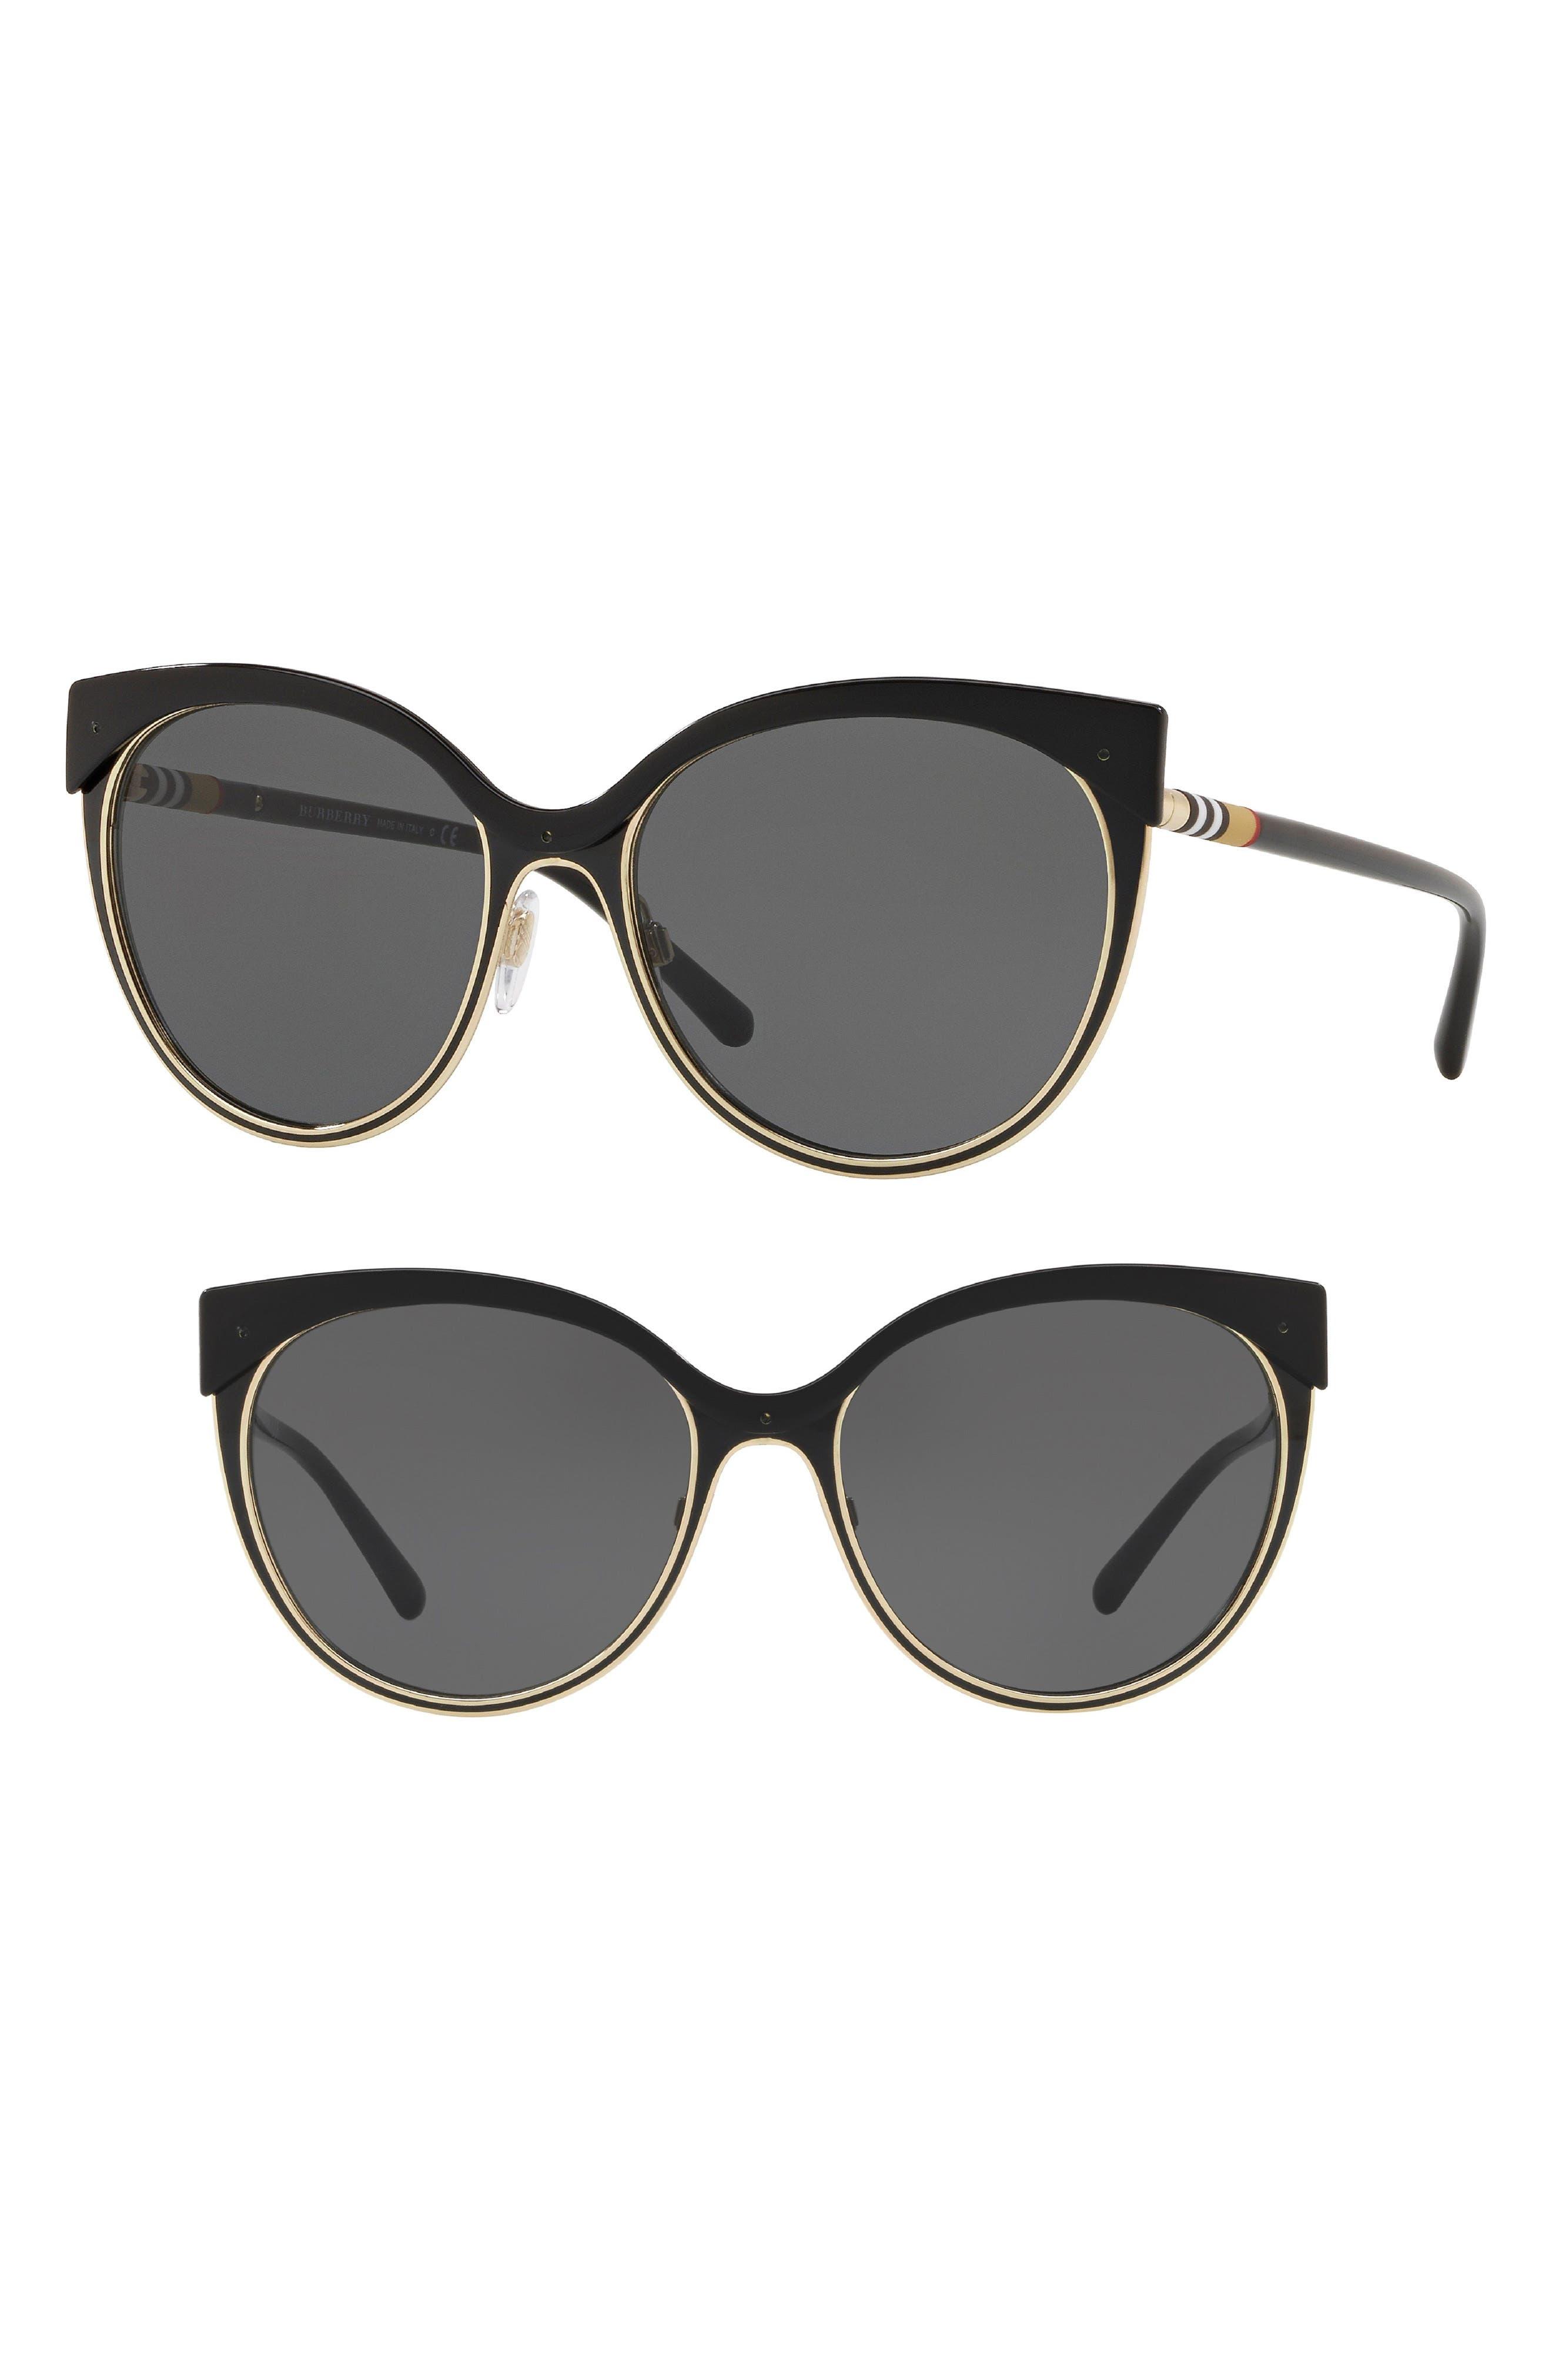 Heritage 55mm Cat Eye Sunglasses,                             Main thumbnail 1, color,                             713